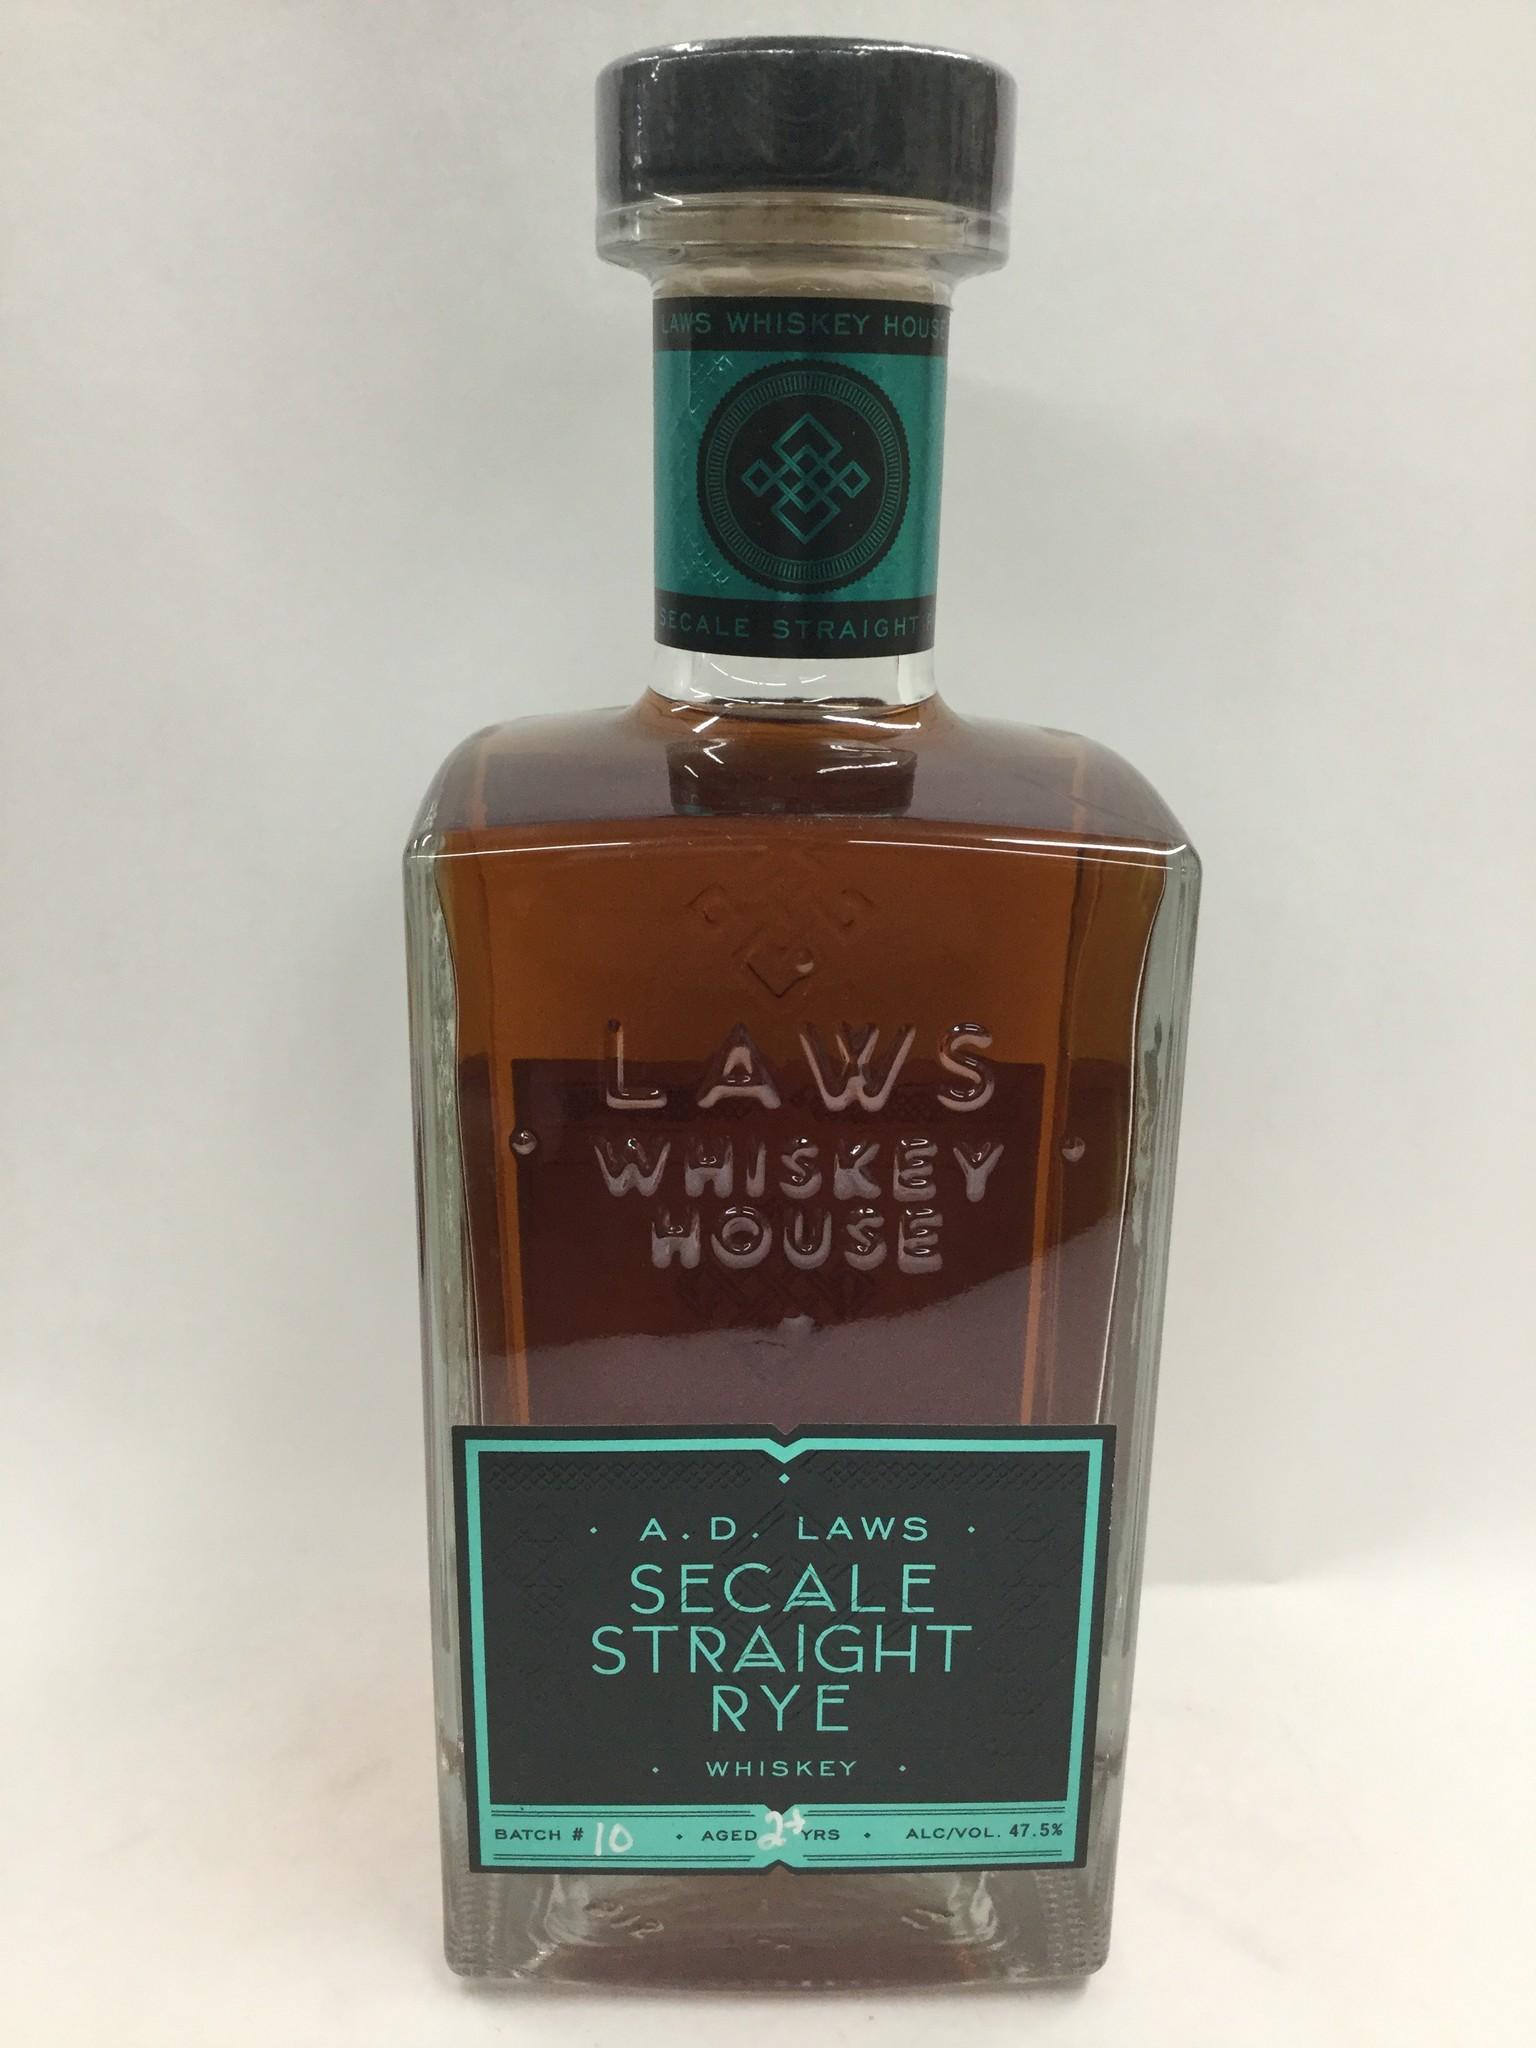 Laws San Luis Valley Straight Rye Whiskey 95Pf. 750ml